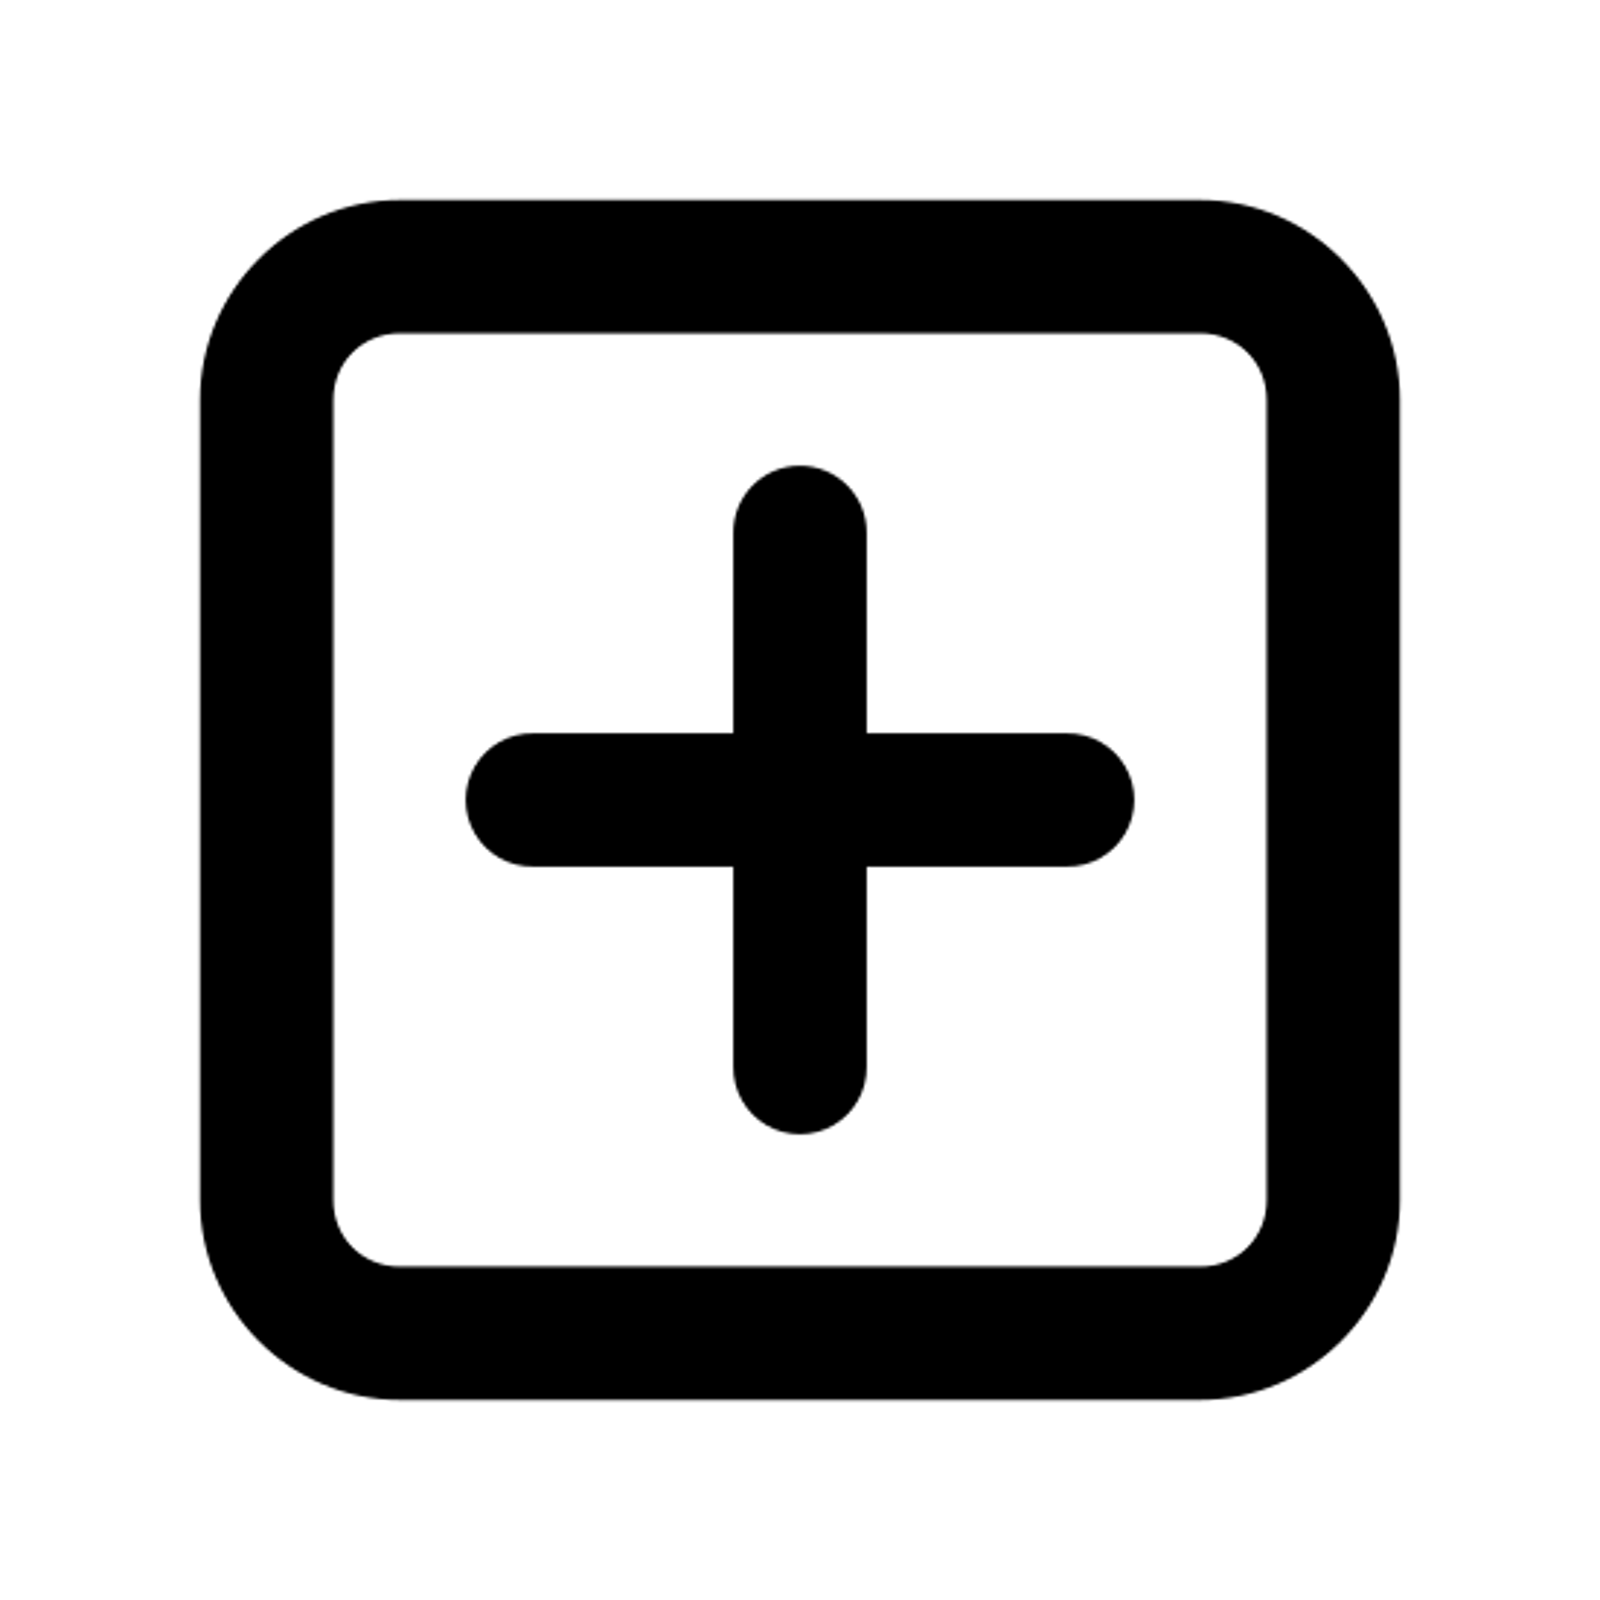 Add New icon